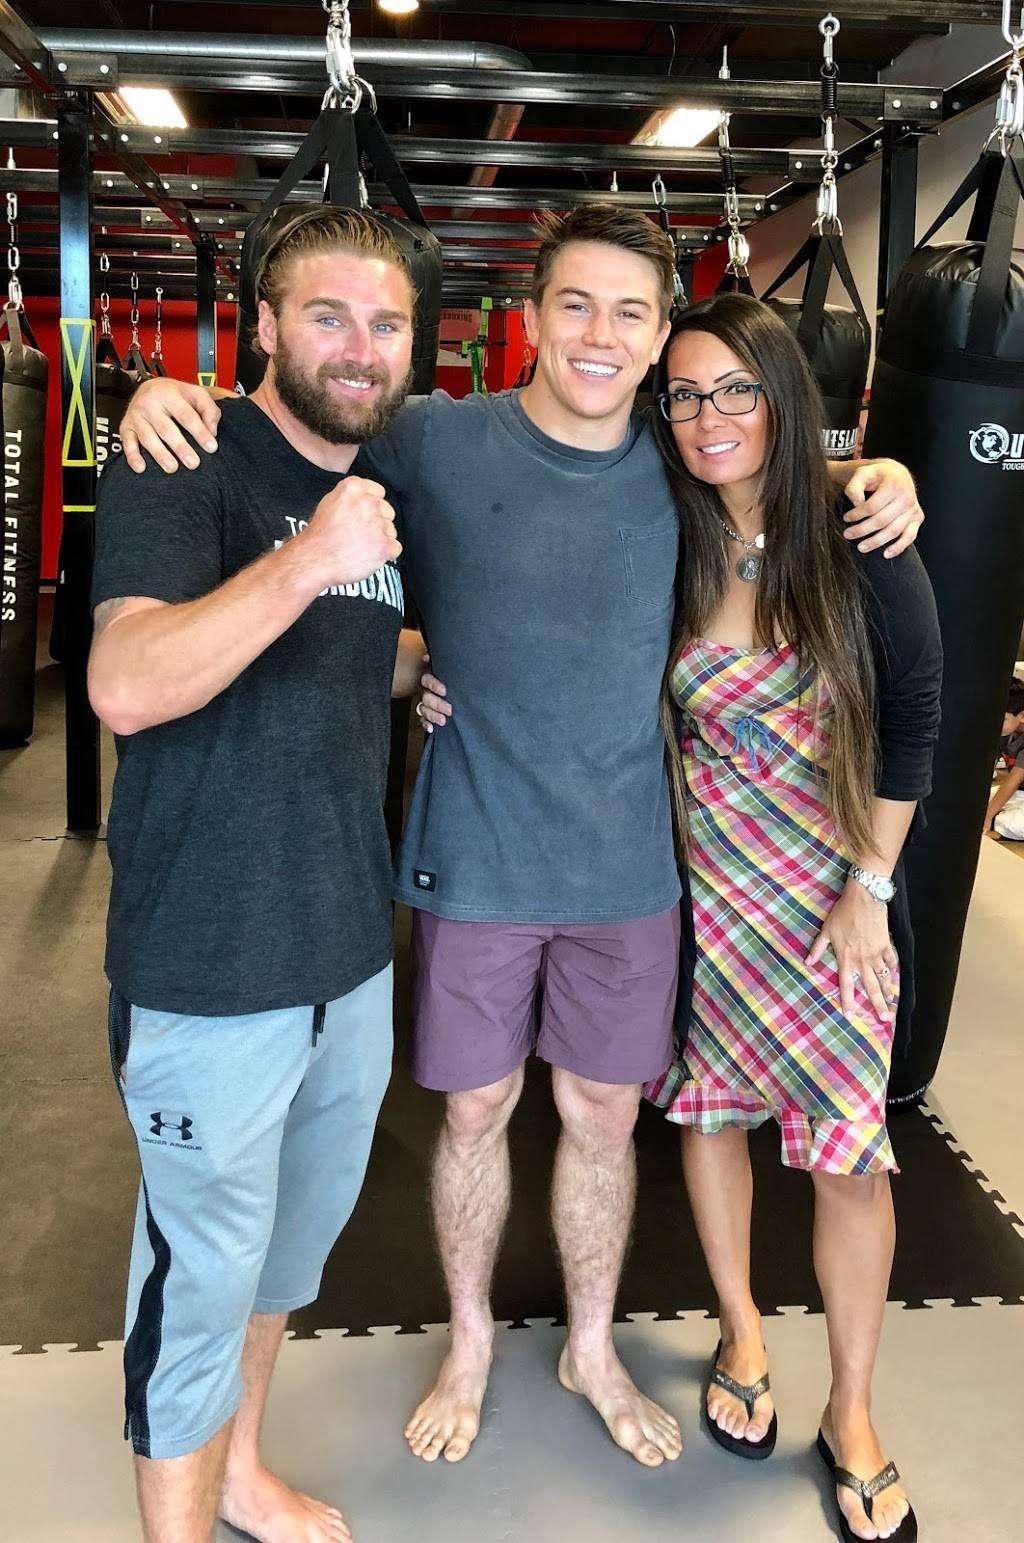 Total Fitness Kickboxing - South Austin, TX - gym    Photo 8 of 8   Address: 3601 W William Cannon Dr # 225, Austin, TX 78749, USA   Phone: (512) 470-5277